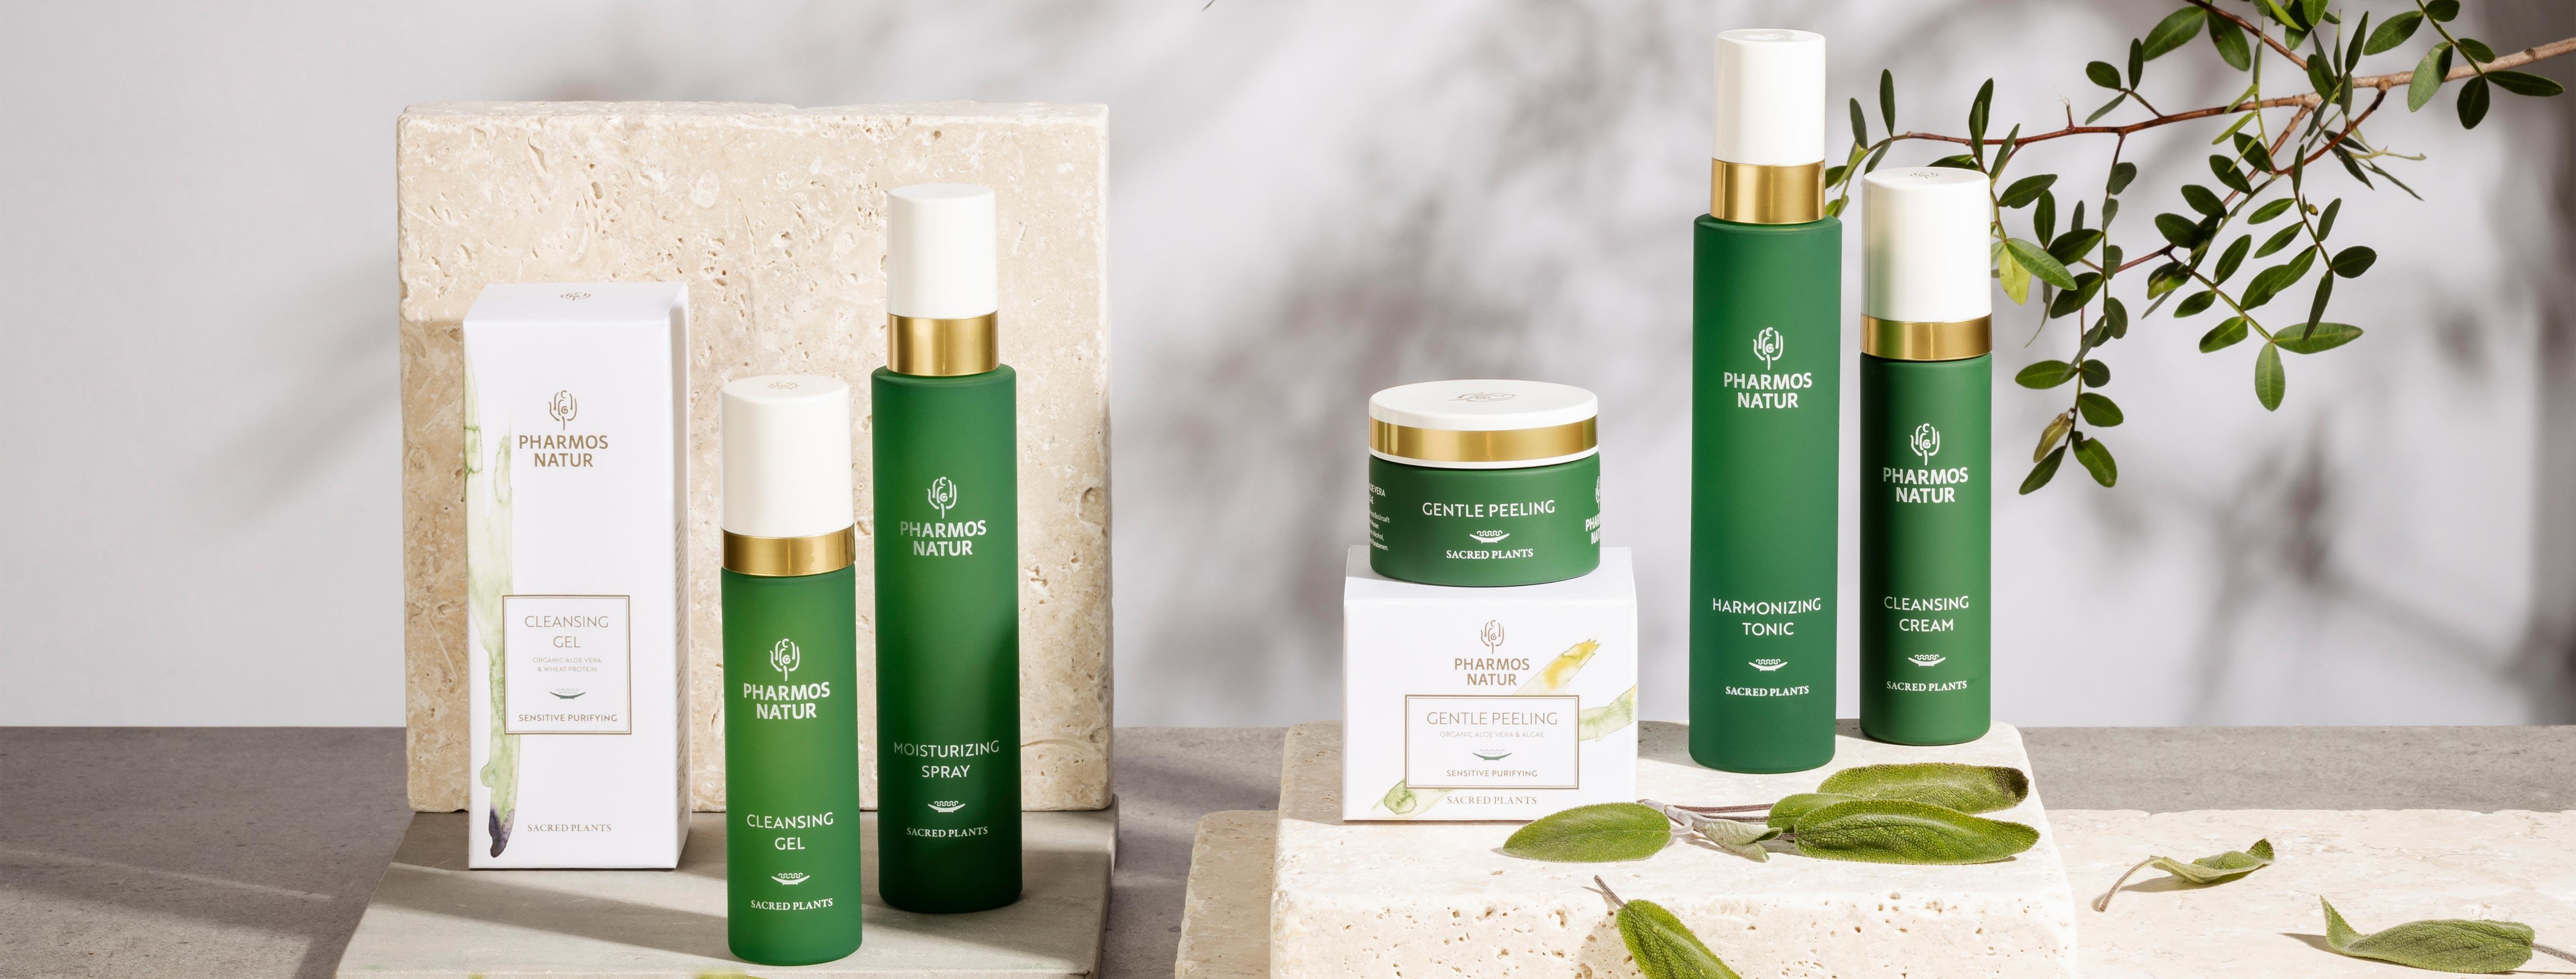 Produktlinie Sensitive Purifying mit Cleansing Gel, Moisturizing Spray, Gentle Peeling, Harmonizing Tonic und Cleansing Cream